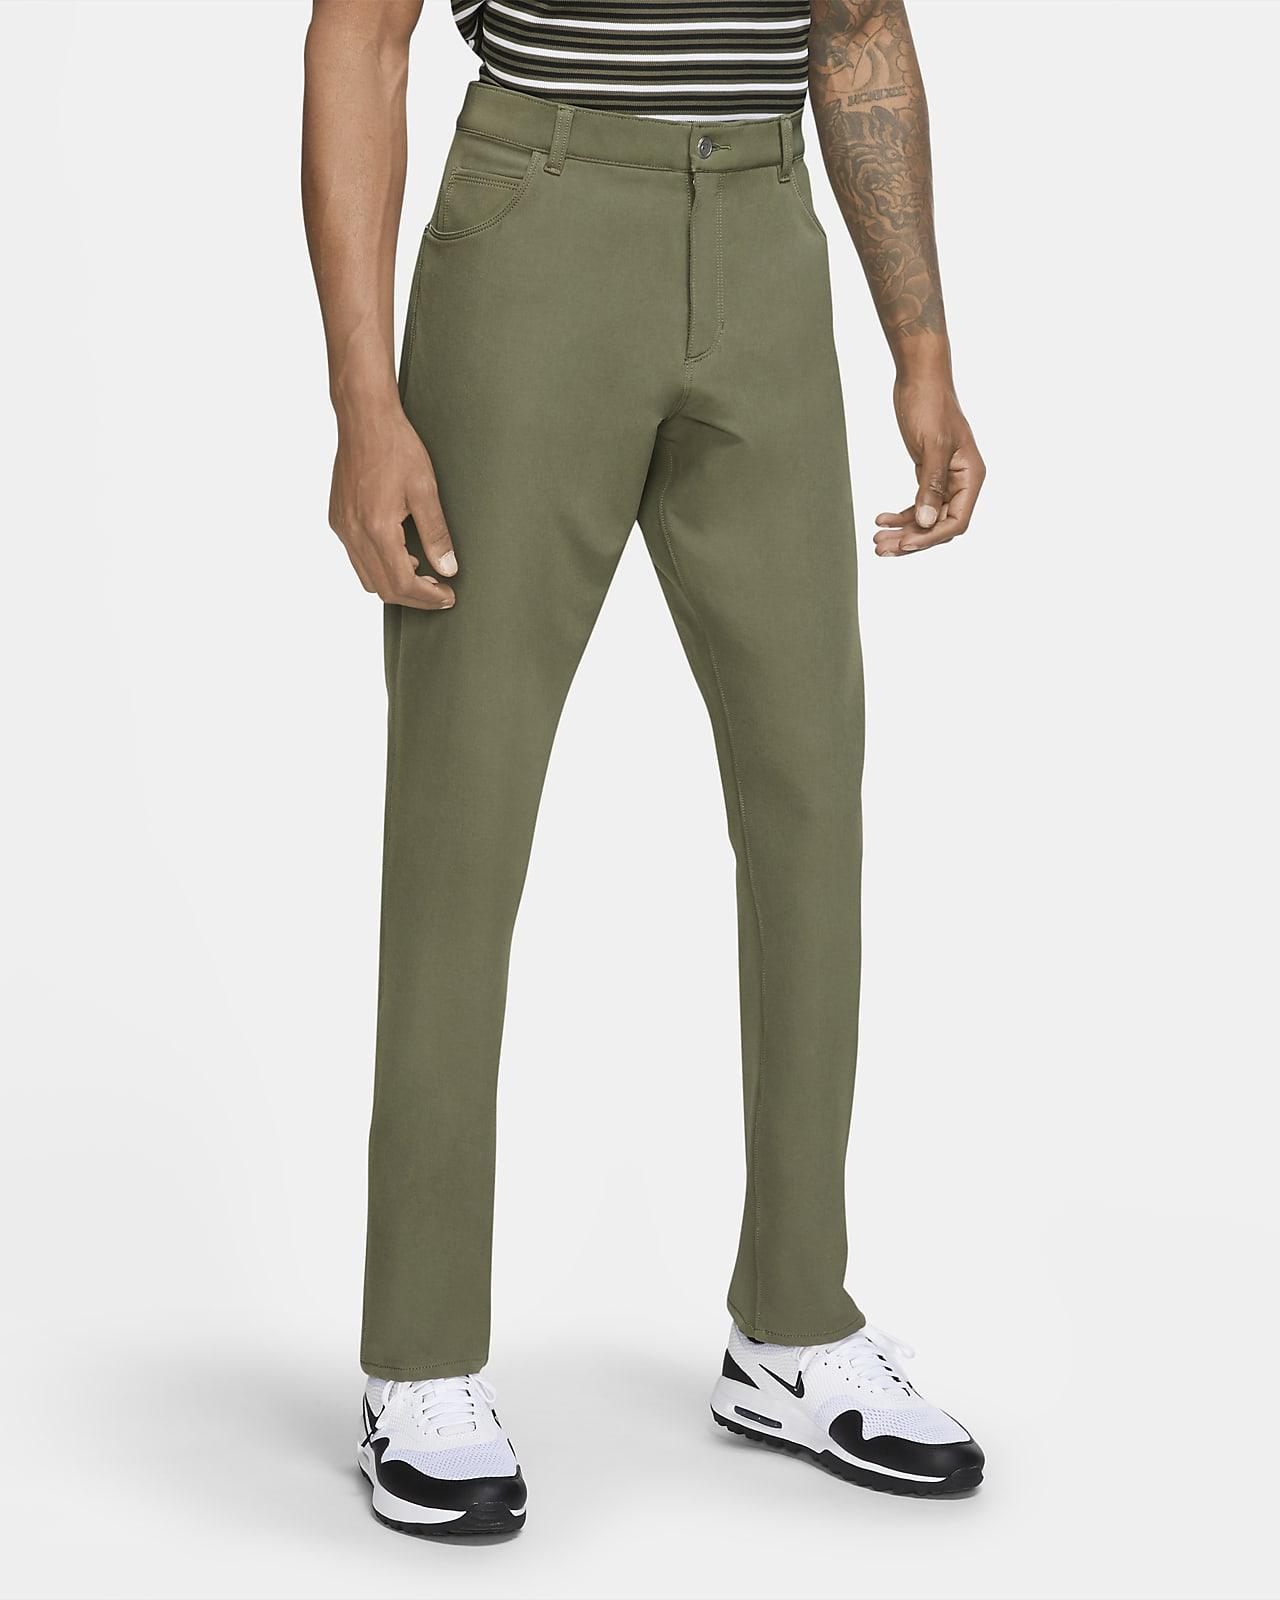 Pantalones para golf de ajuste entallado para hombre Nike Flex Repel